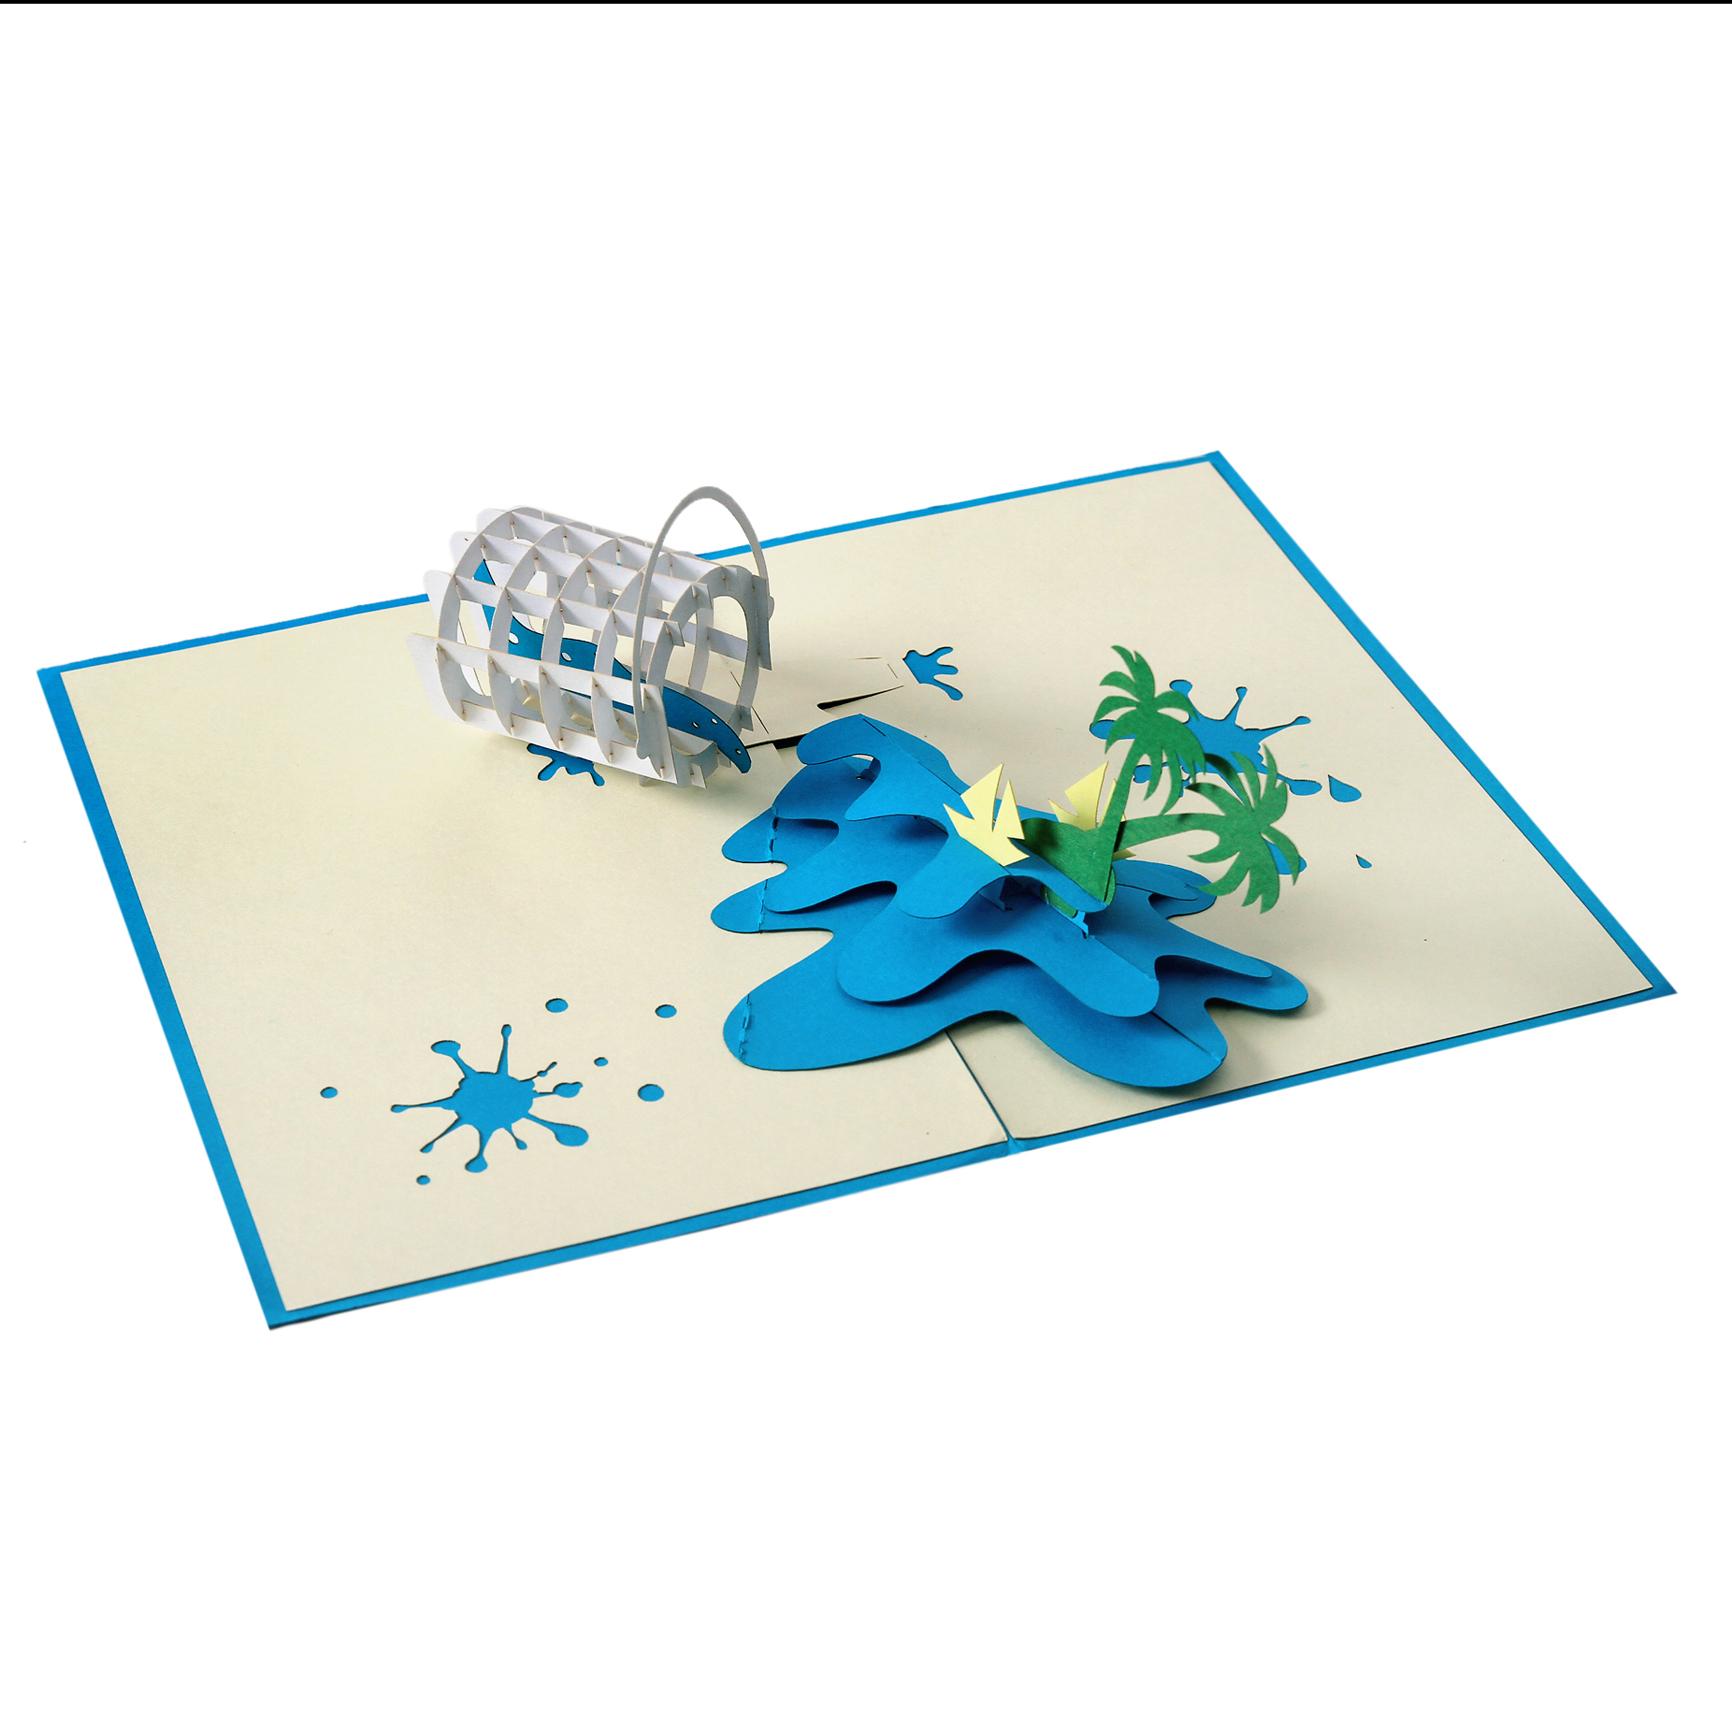 डी ग्रीटिंग कार्ड पॉप अप प्यार कार्ड/निमंत्रण/उपहार/जन्मदिन/कार्ड के साथ आवृत